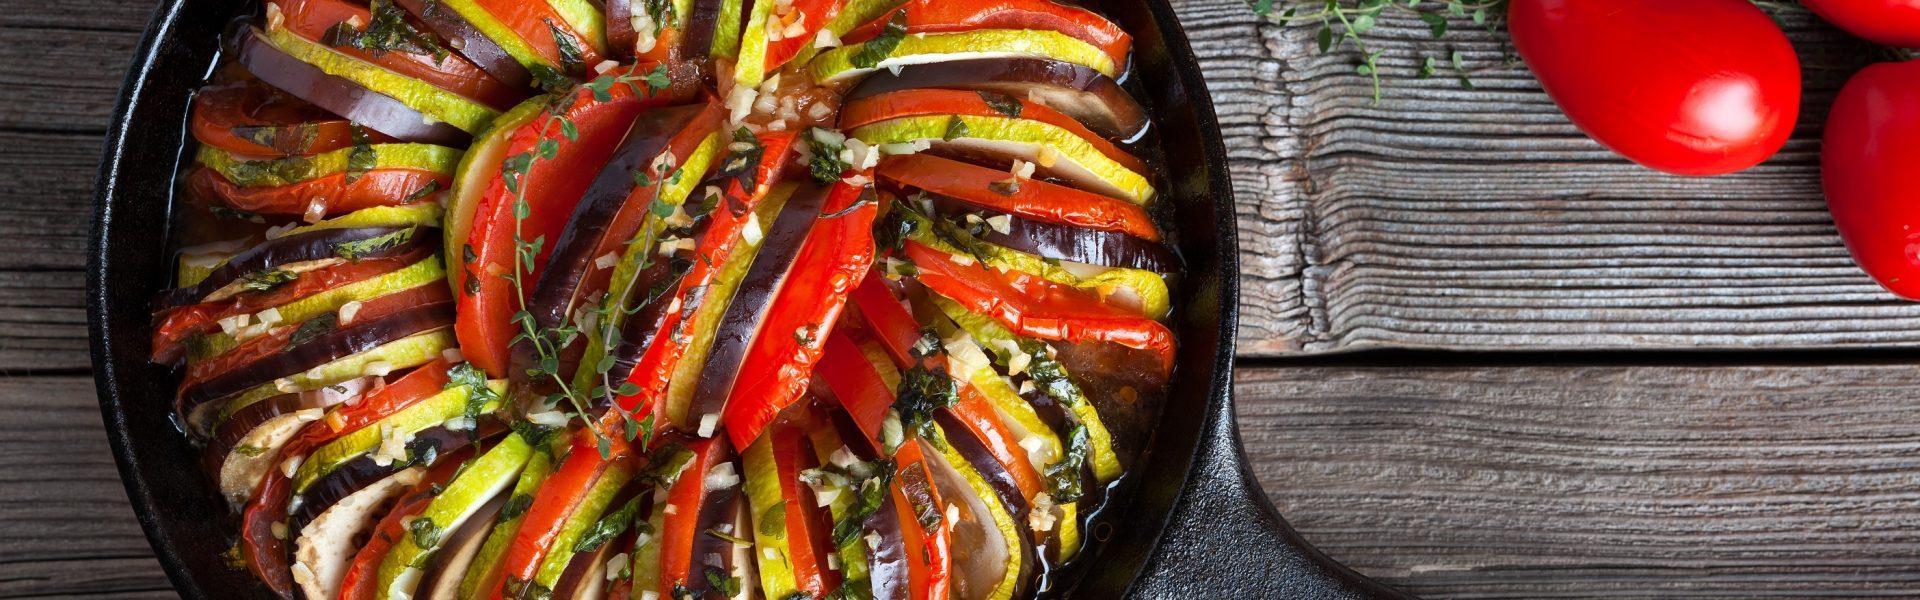 Ratatouille – miešaná zeleninová lahôdka